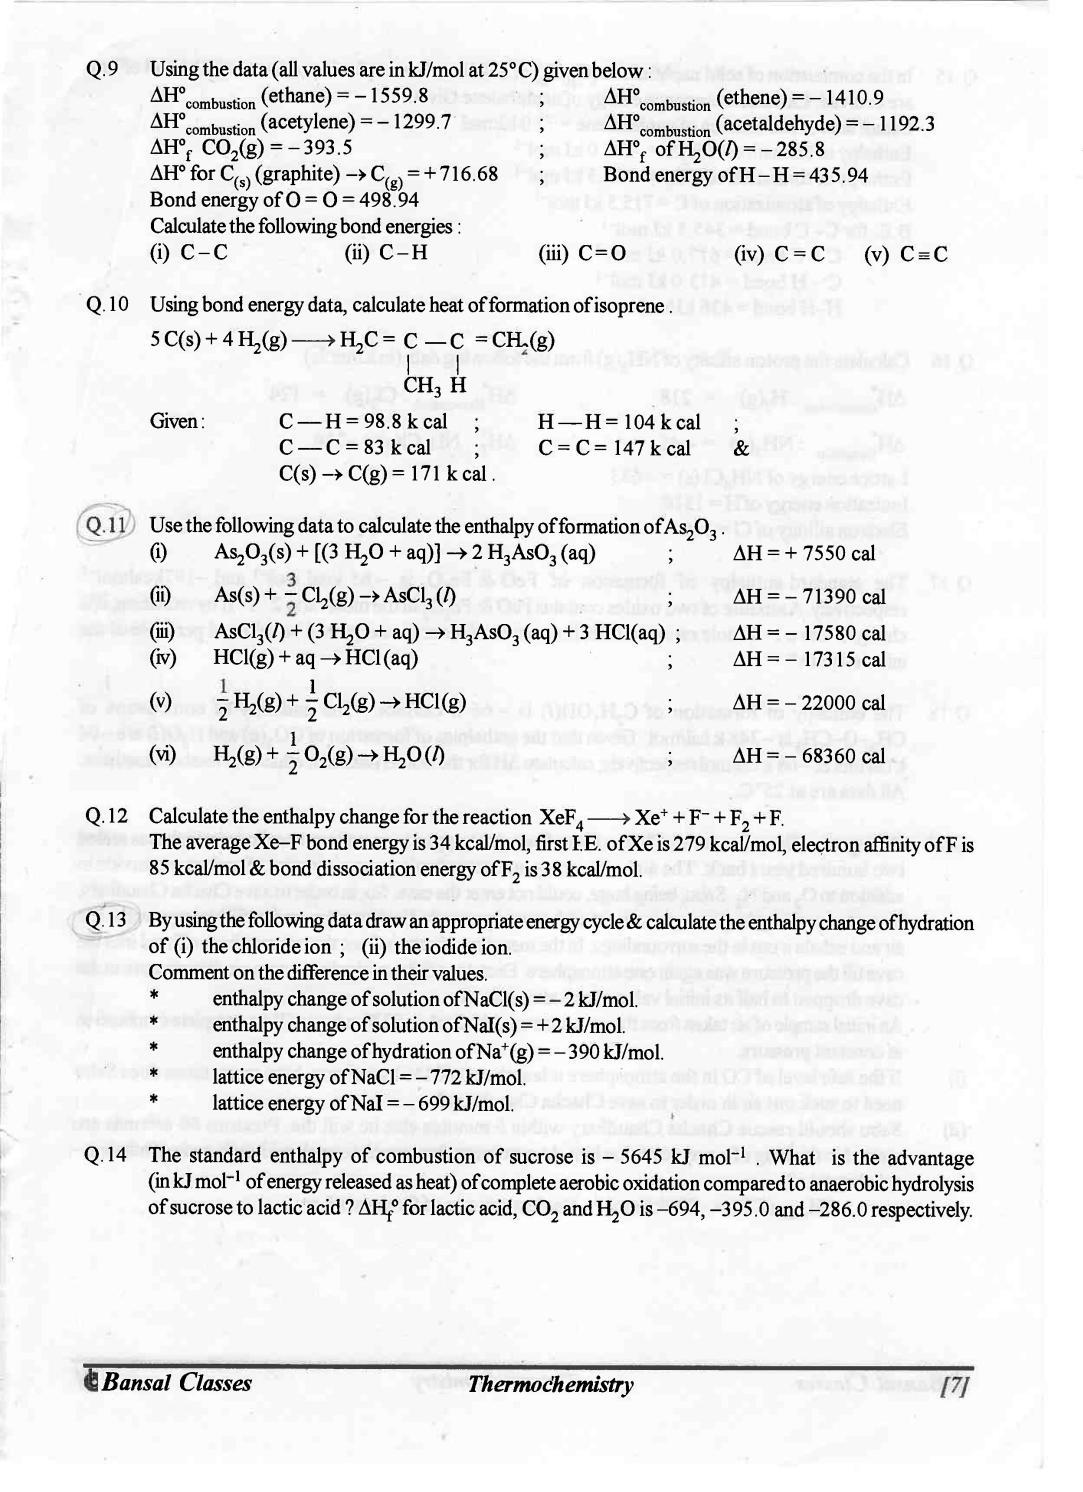 bansal classes chemistry study